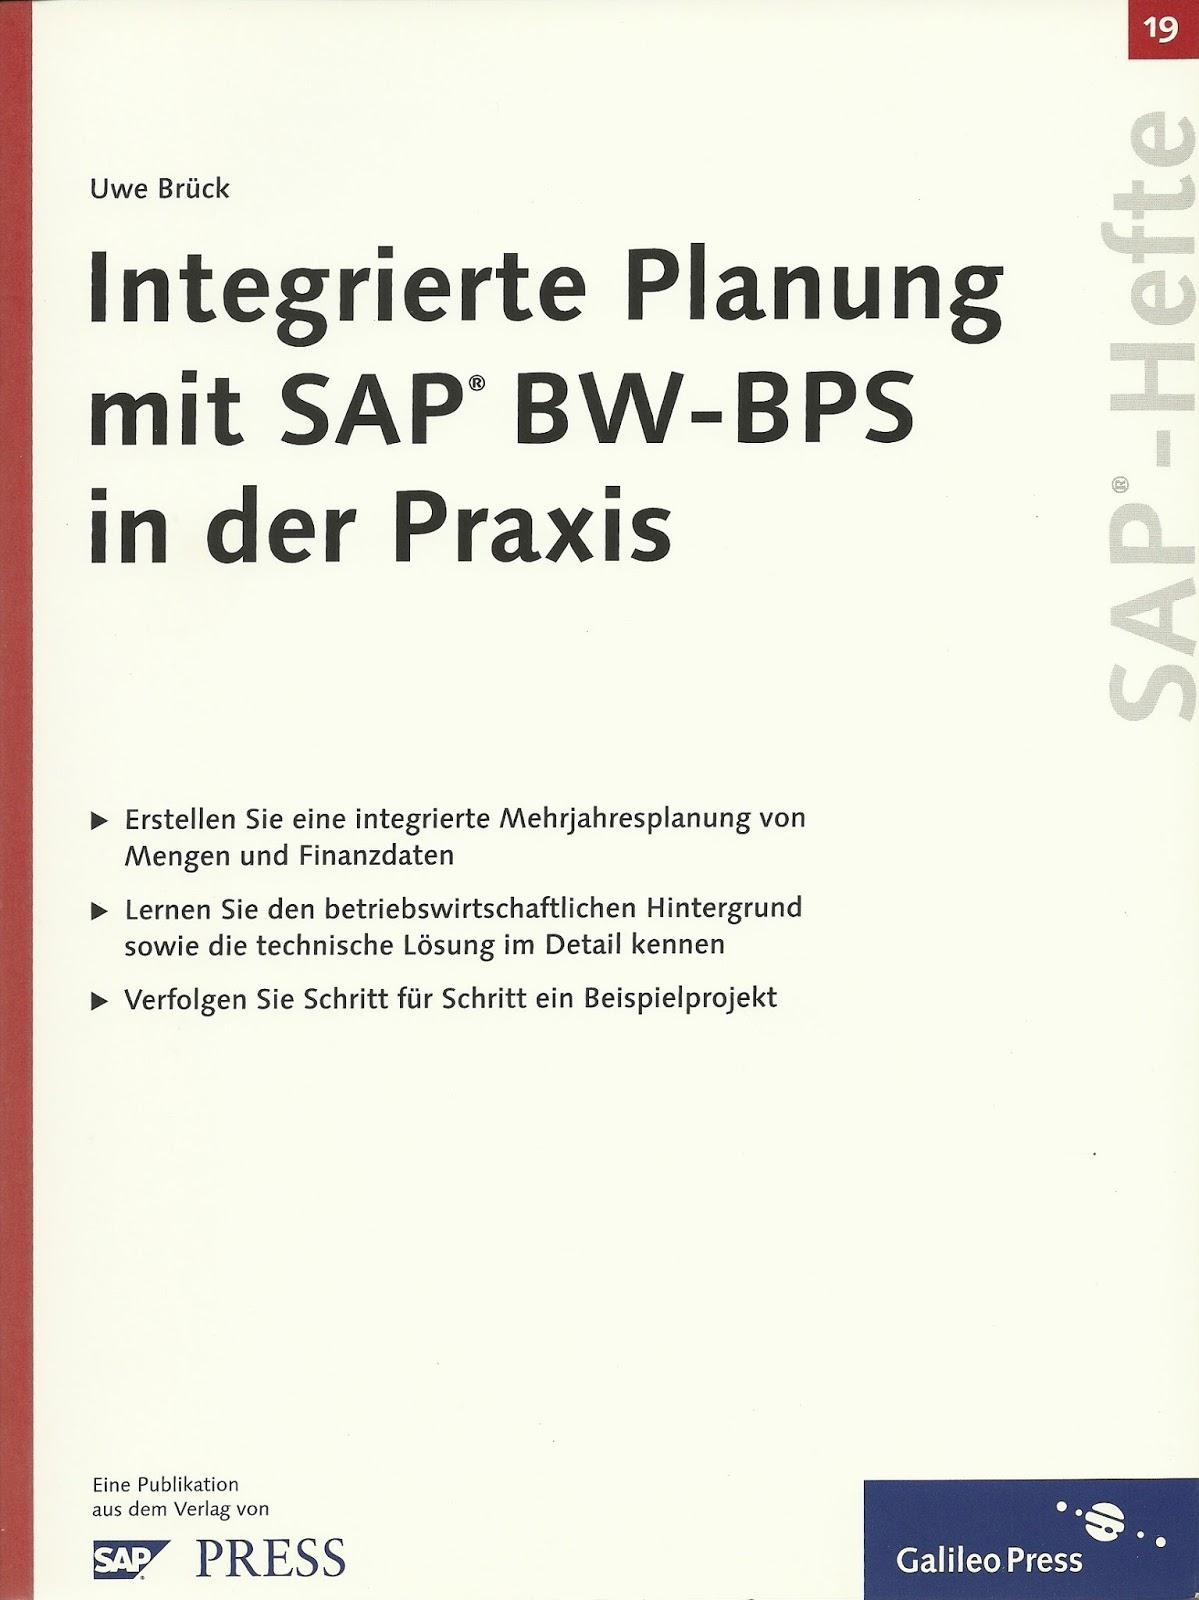 Buch-Cover: Integrierte Planung mit SAP BW-BPS in der Praxis